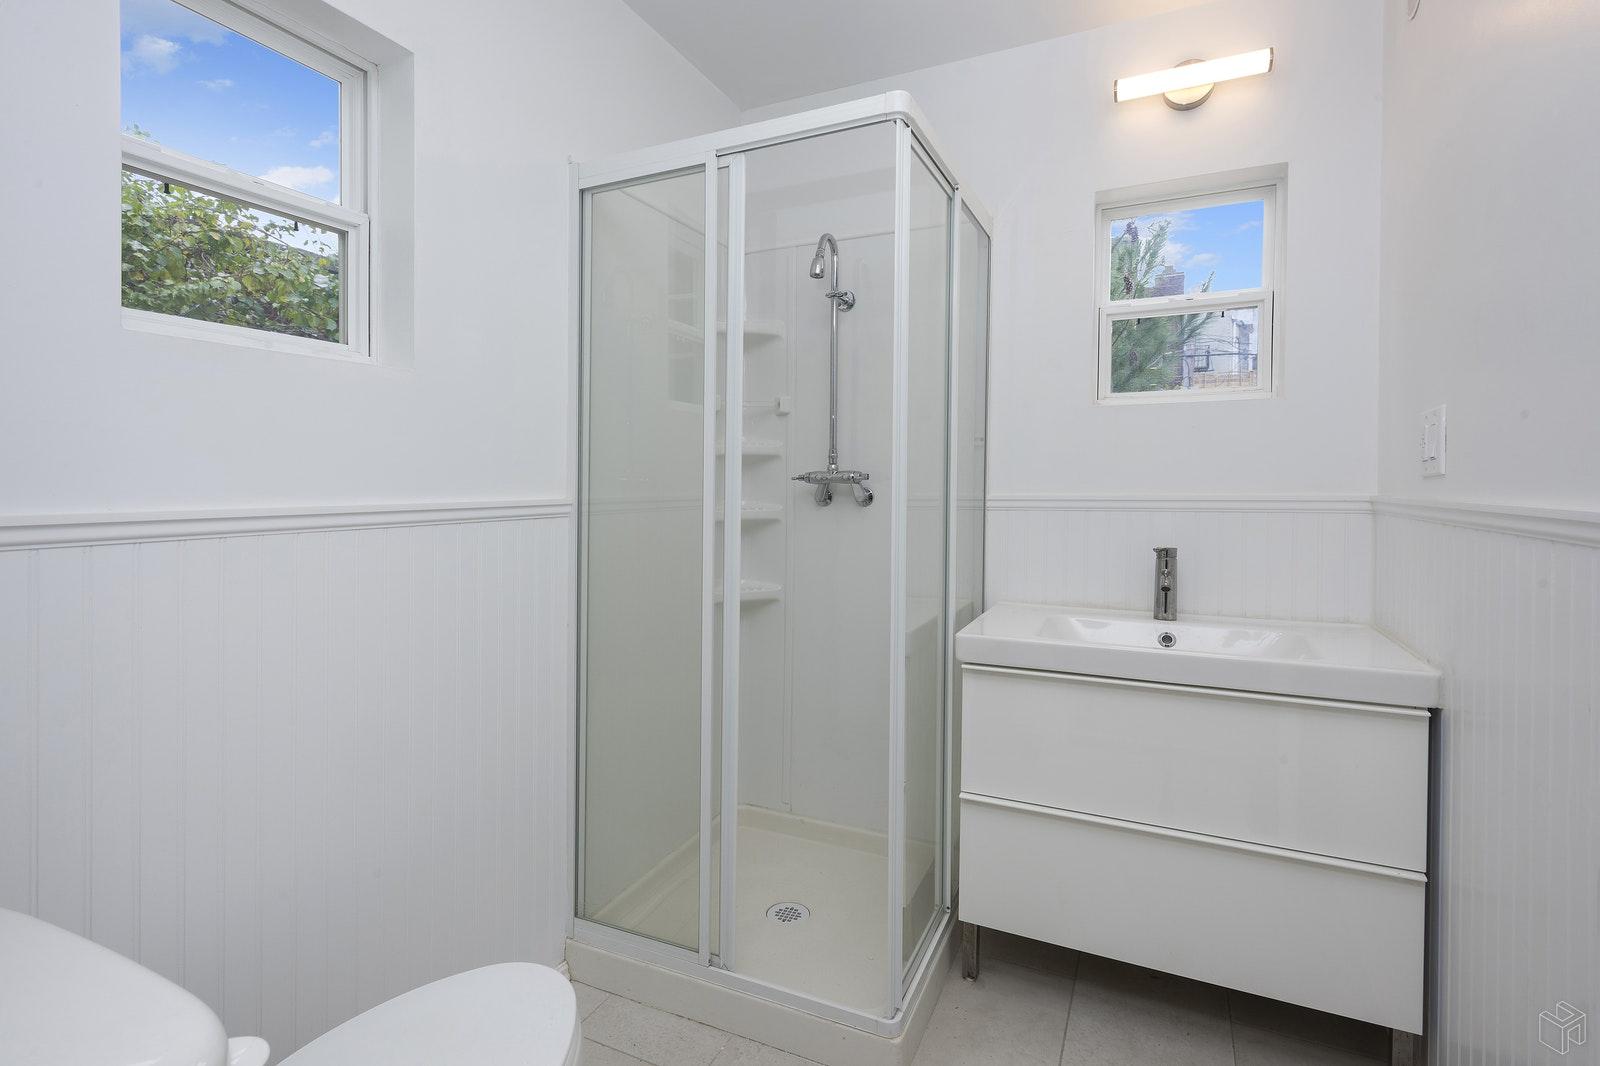 380 WEBSTER AVENUE, Kensington, $980,000, Web #: 19228167